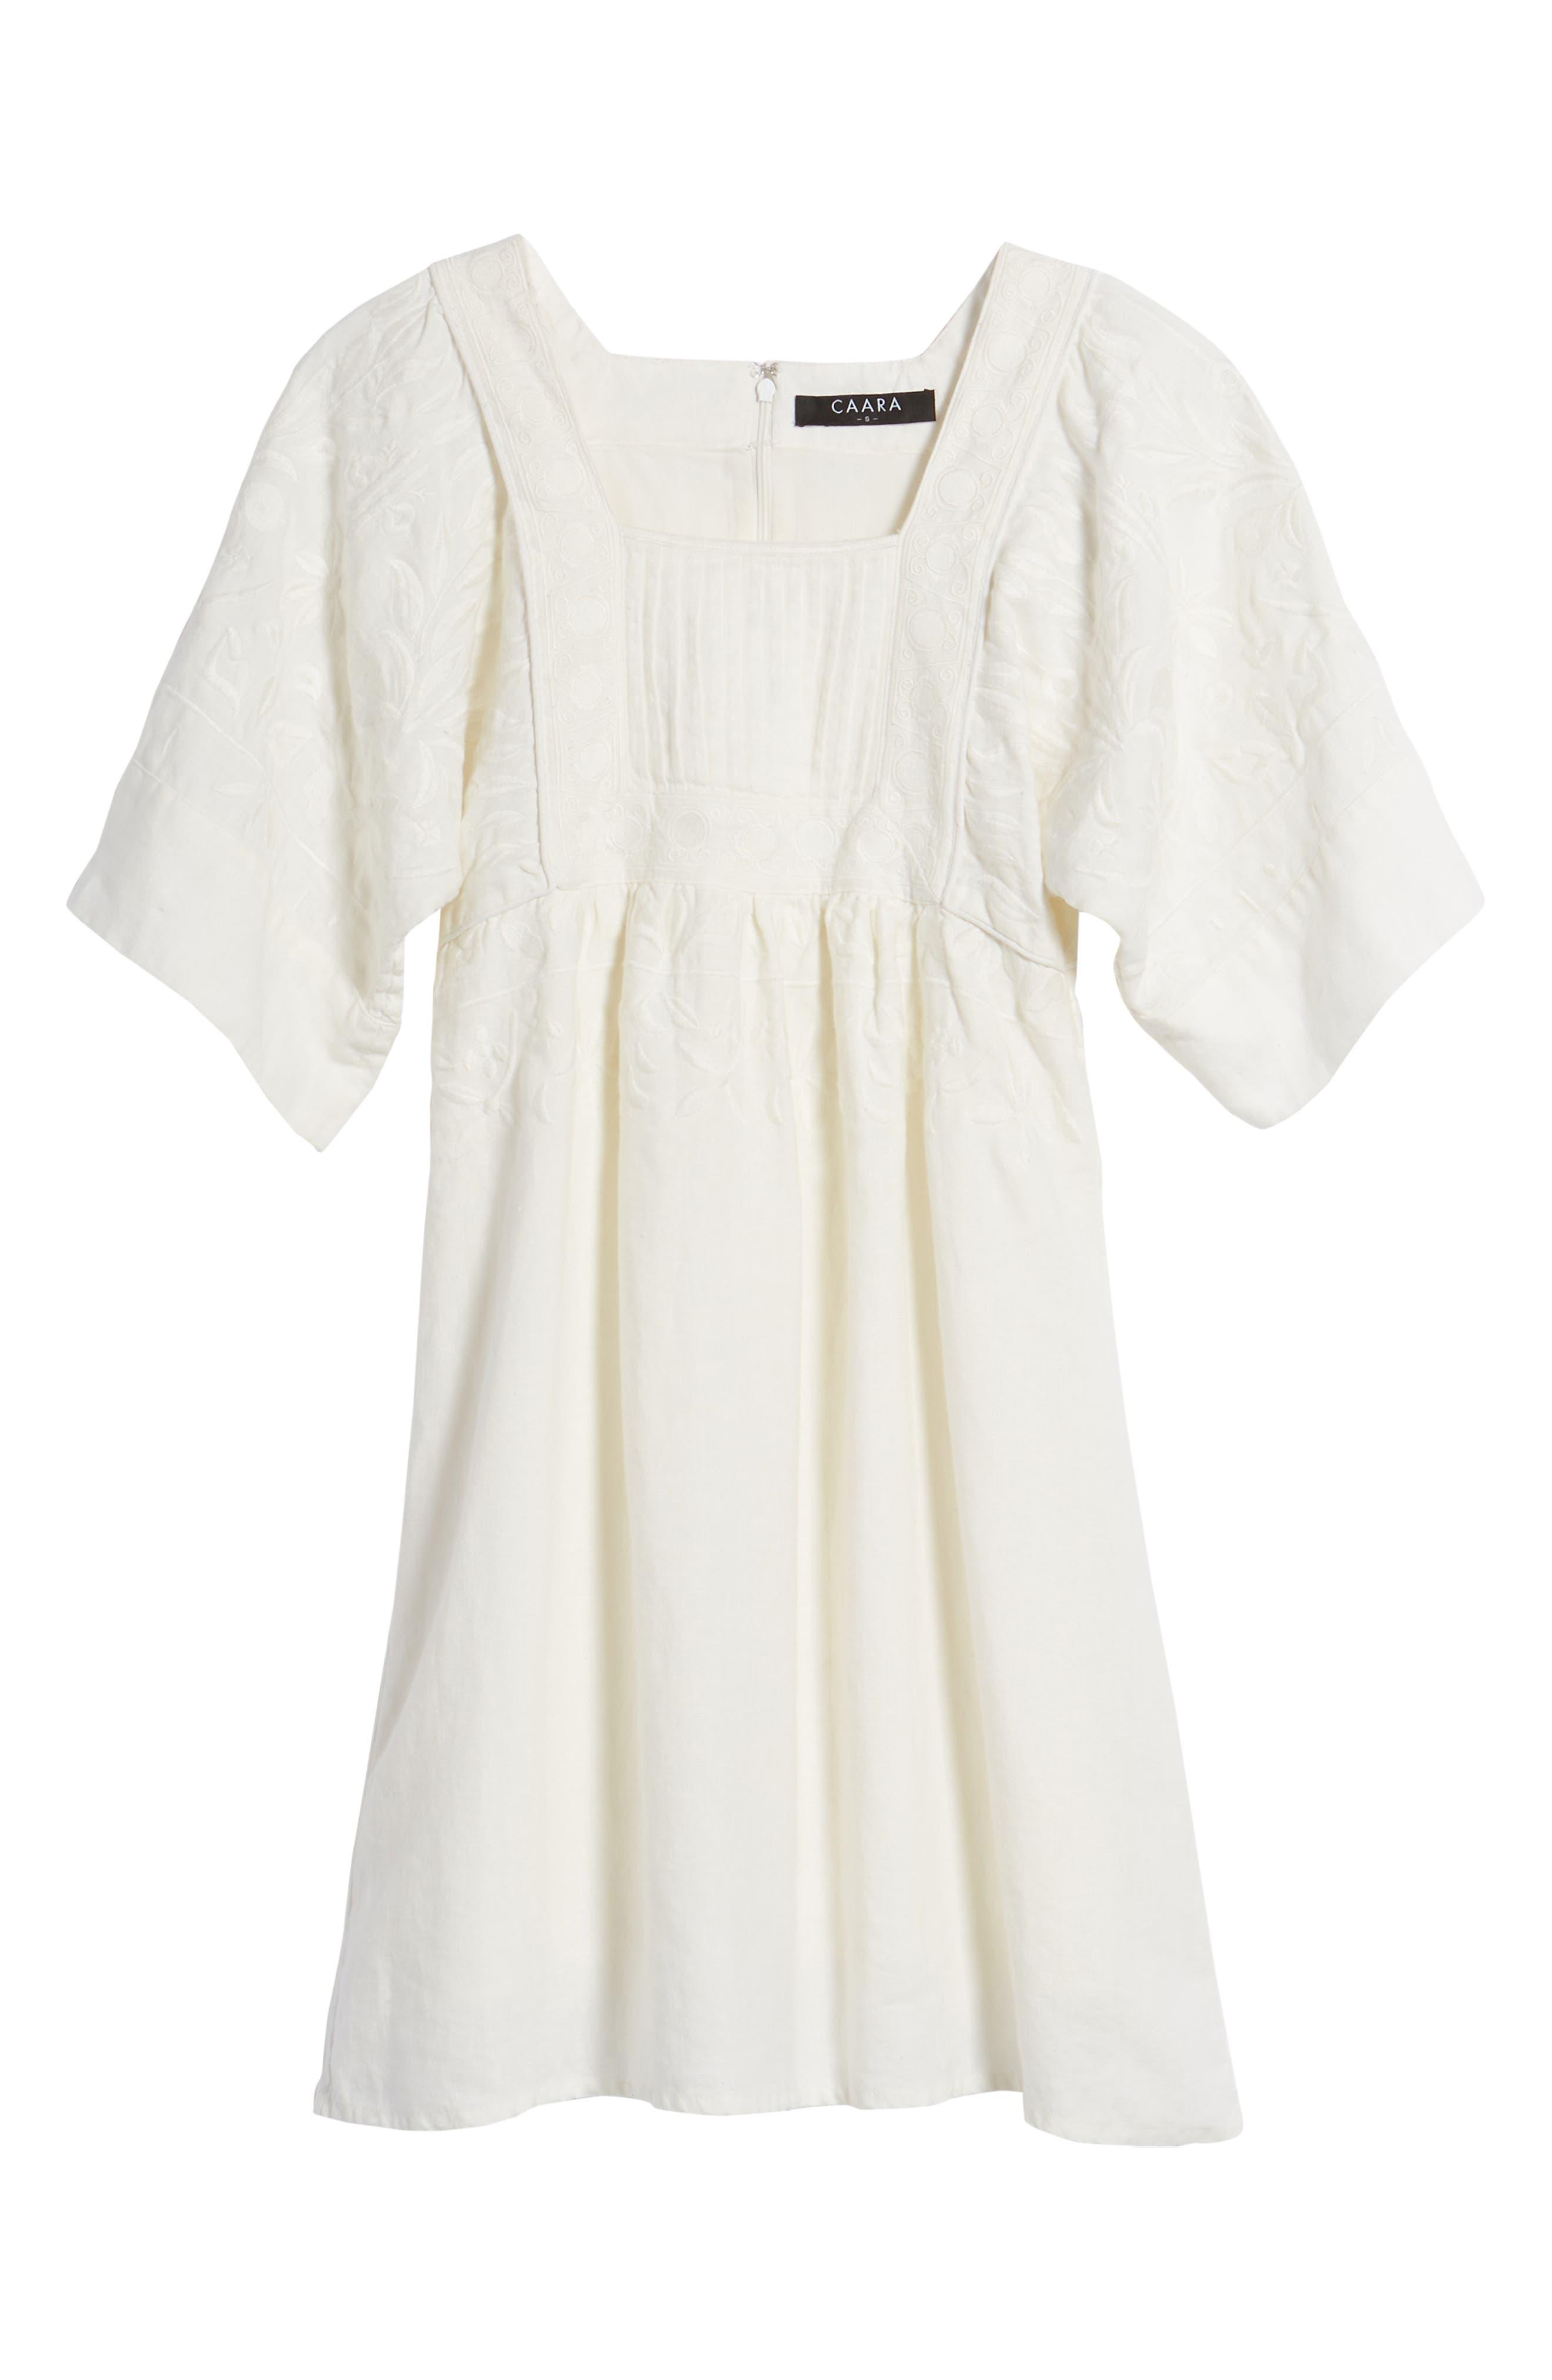 Elisa Embroidered Babydoll Dress,                             Alternate thumbnail 6, color,                             White